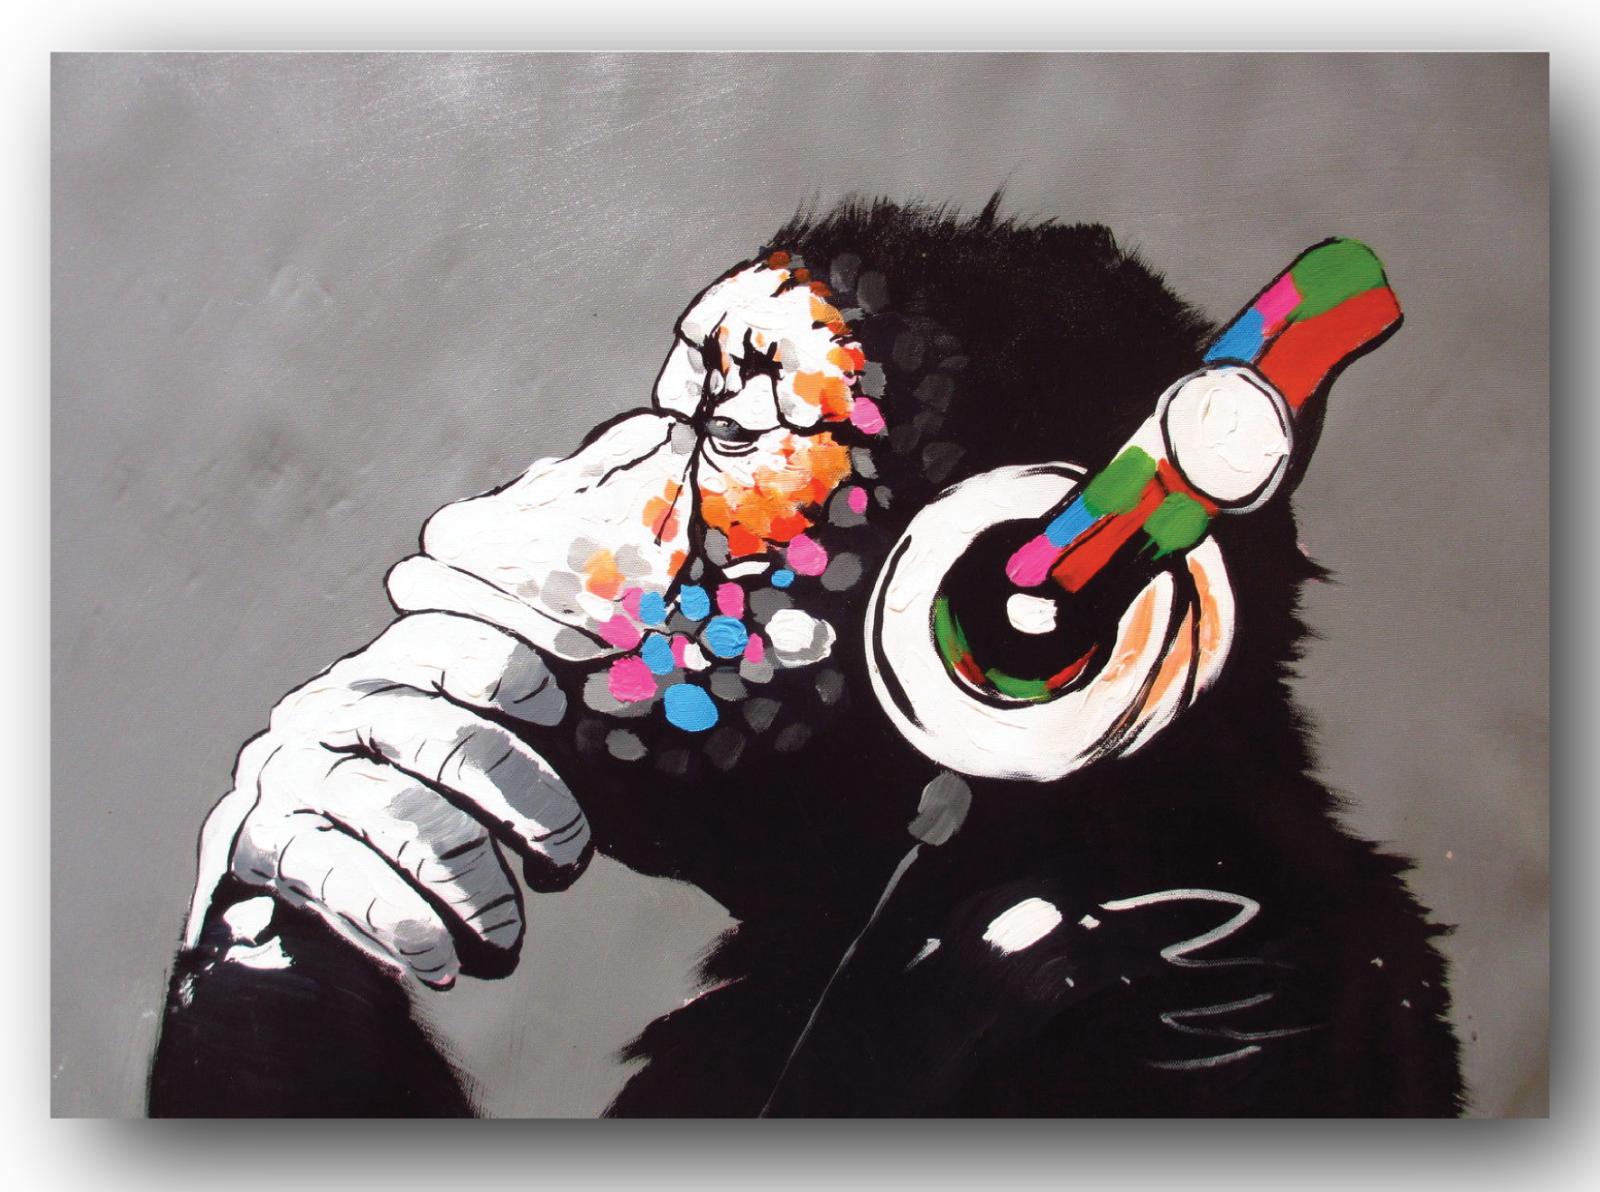 A3 Banksy Laugh Now Poster Graffiti Street Wall Art Print Popular Stencil Monkey For Sale Online Ebay